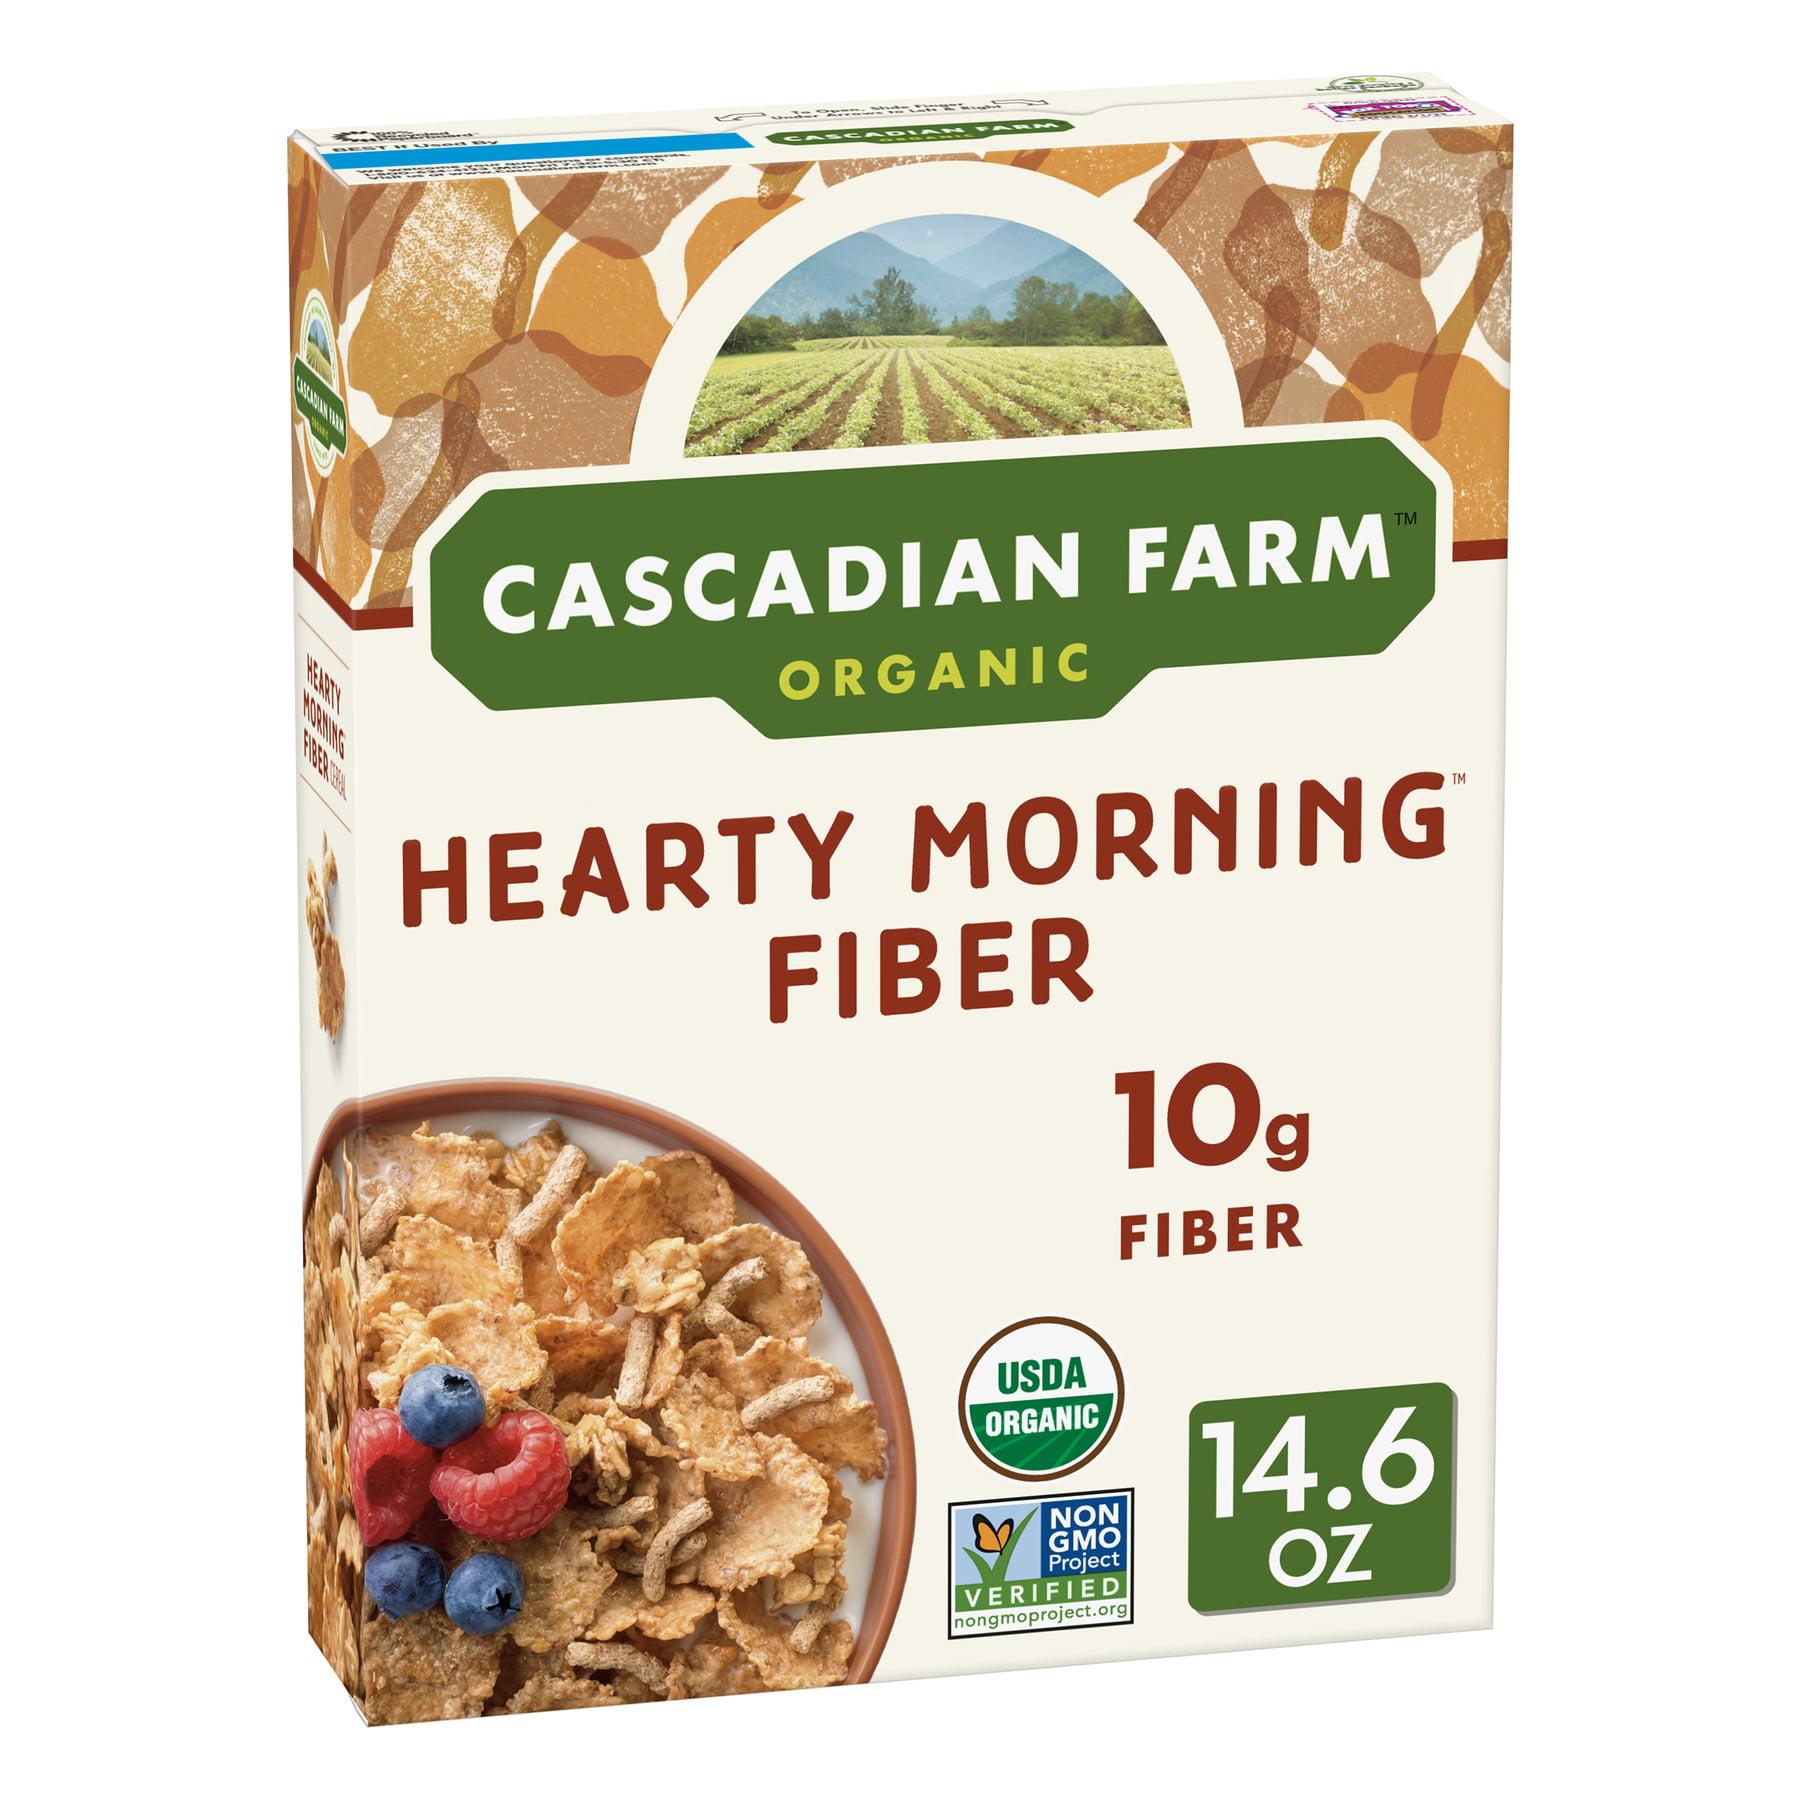 Cascadian Farm Organic Morning Fiber Cereal, 14.6 Oz